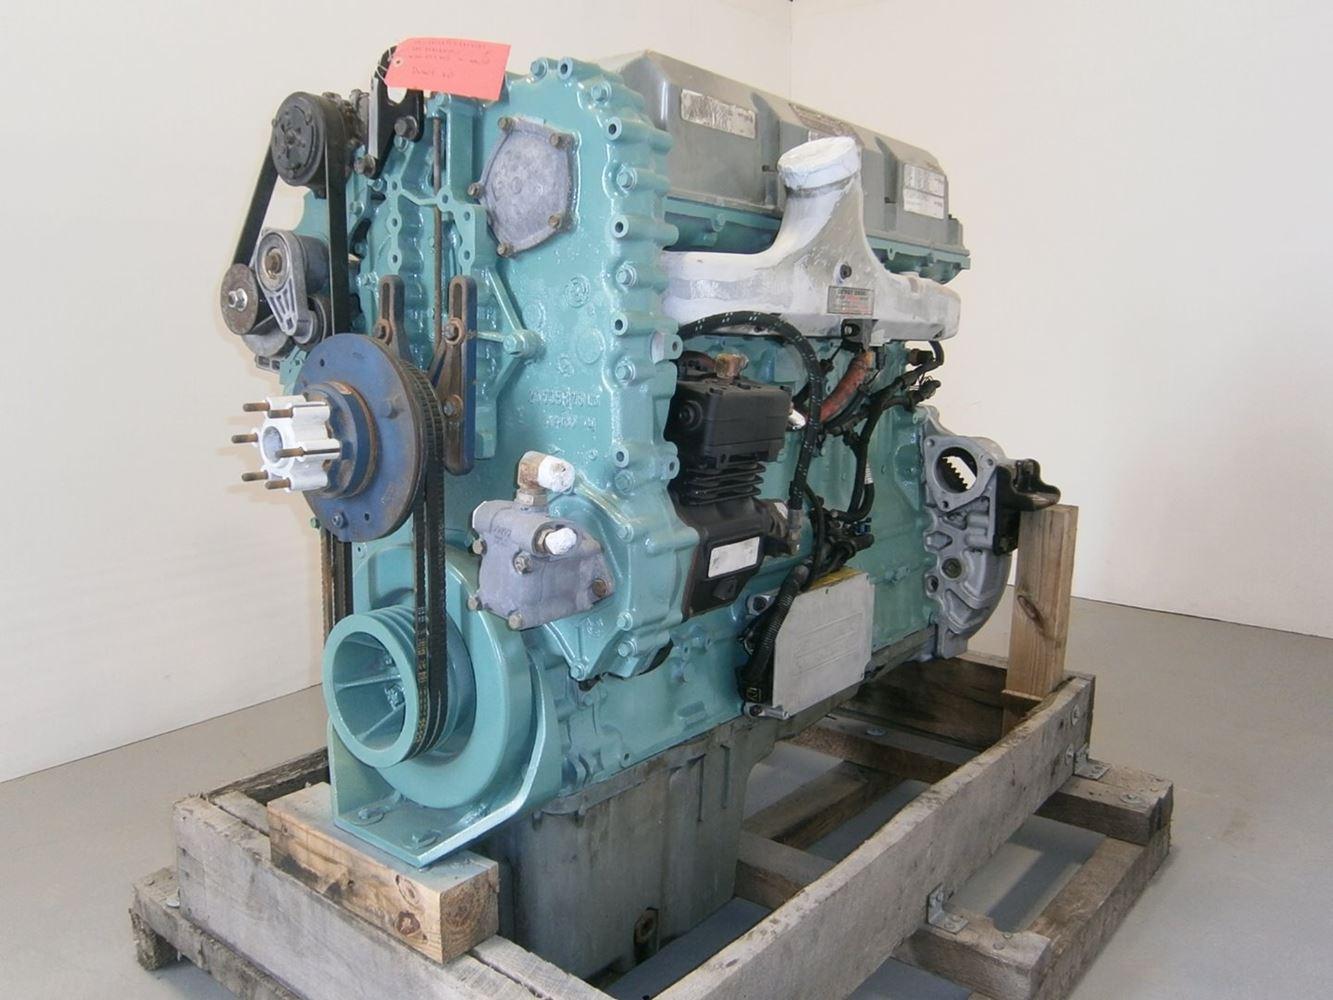 Detroit Series 60 engine wiring Diagram